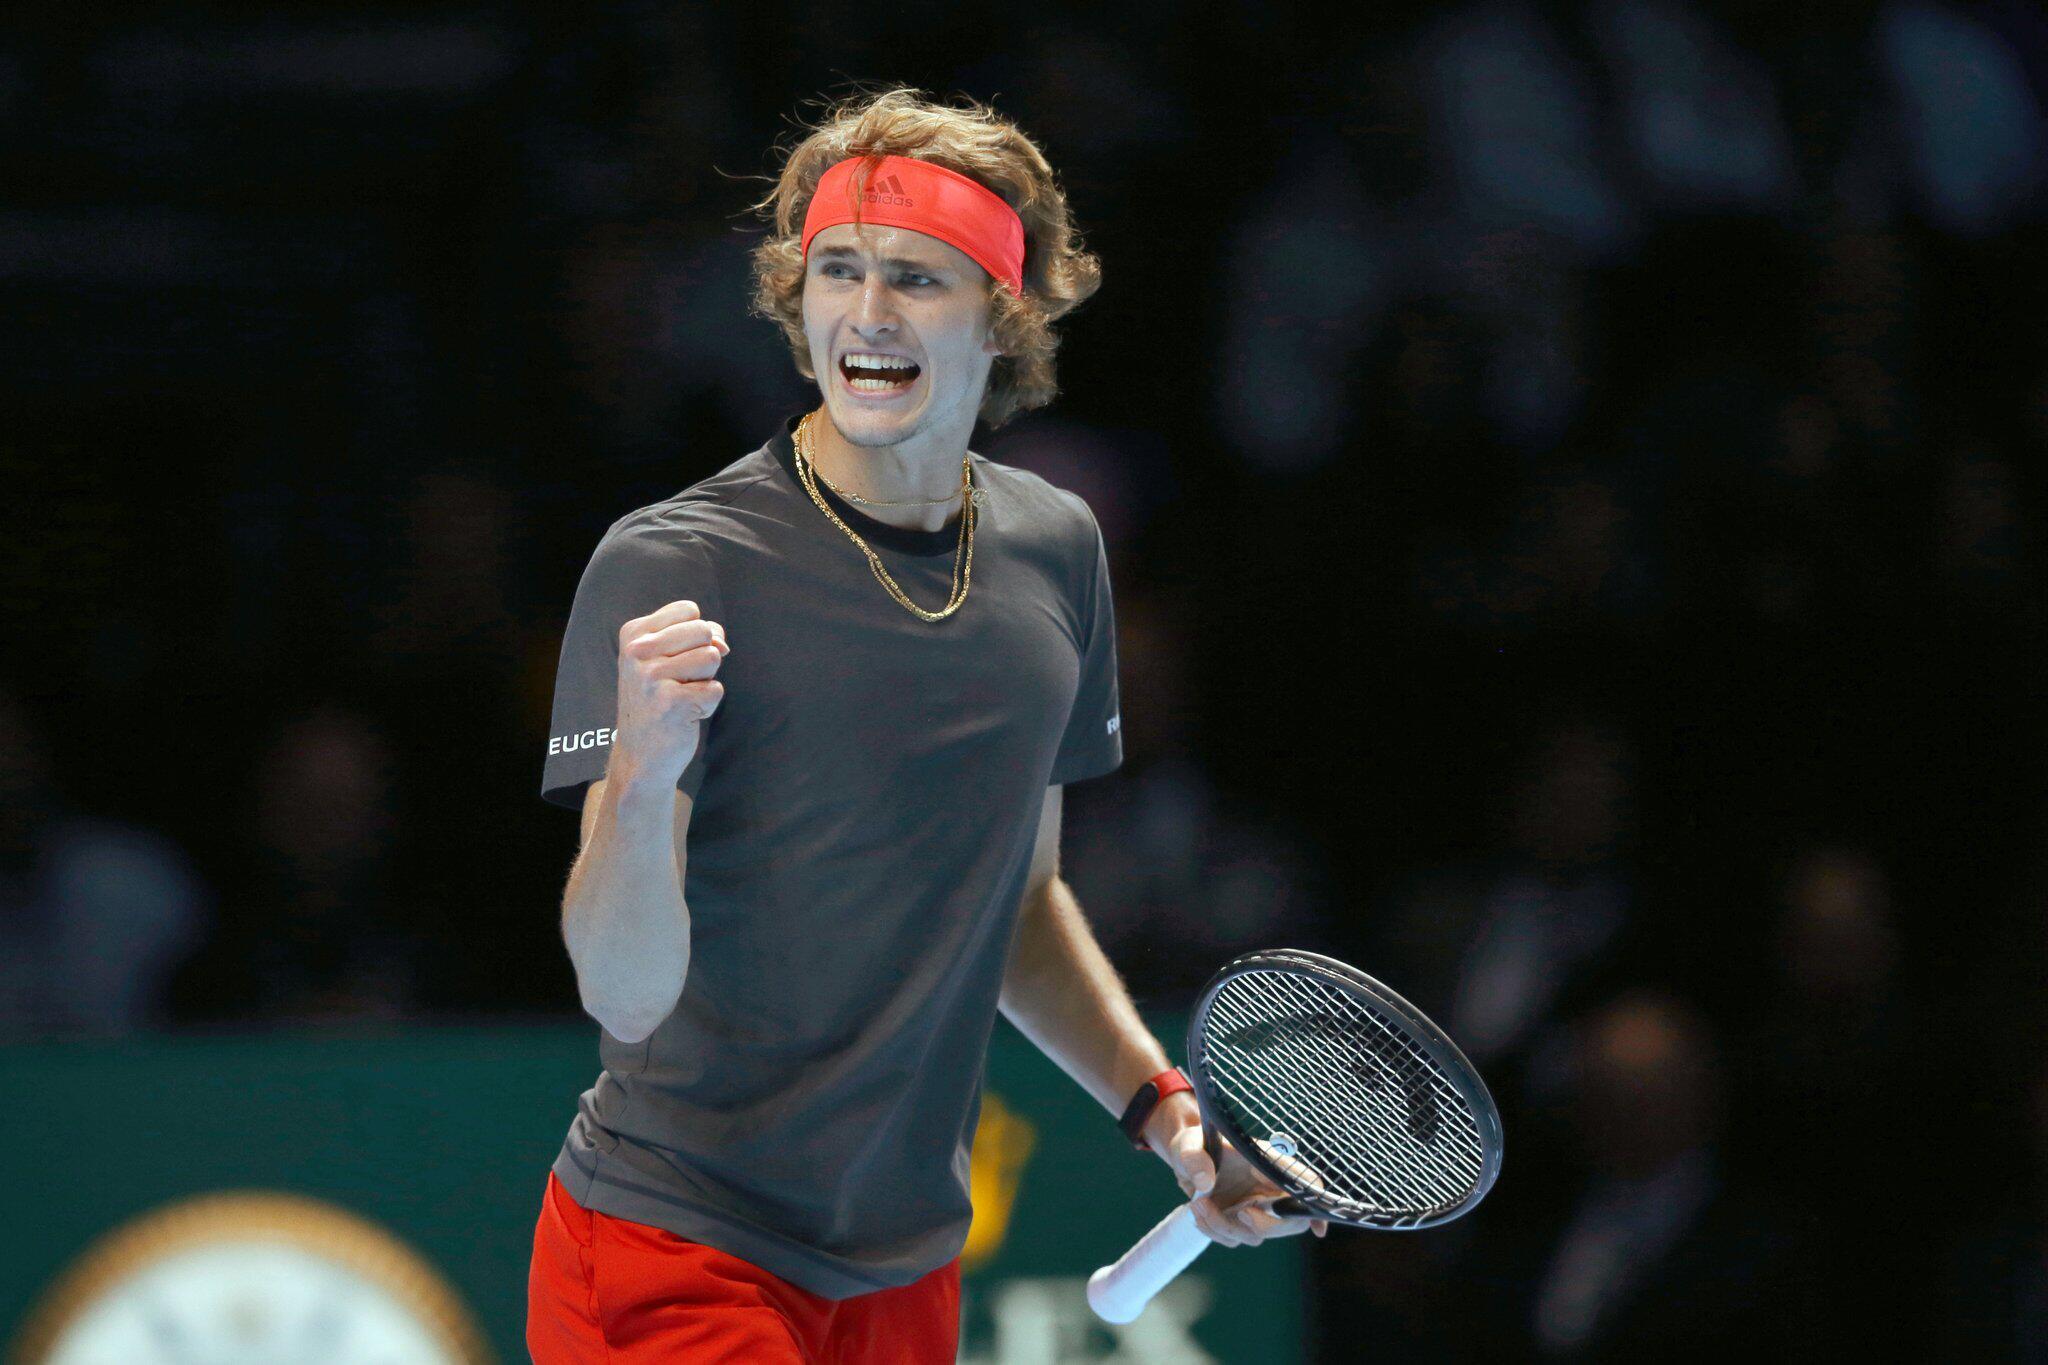 Tennisprofi Alexander Zverev gewinnt ATP-WM in London | WEB.DE